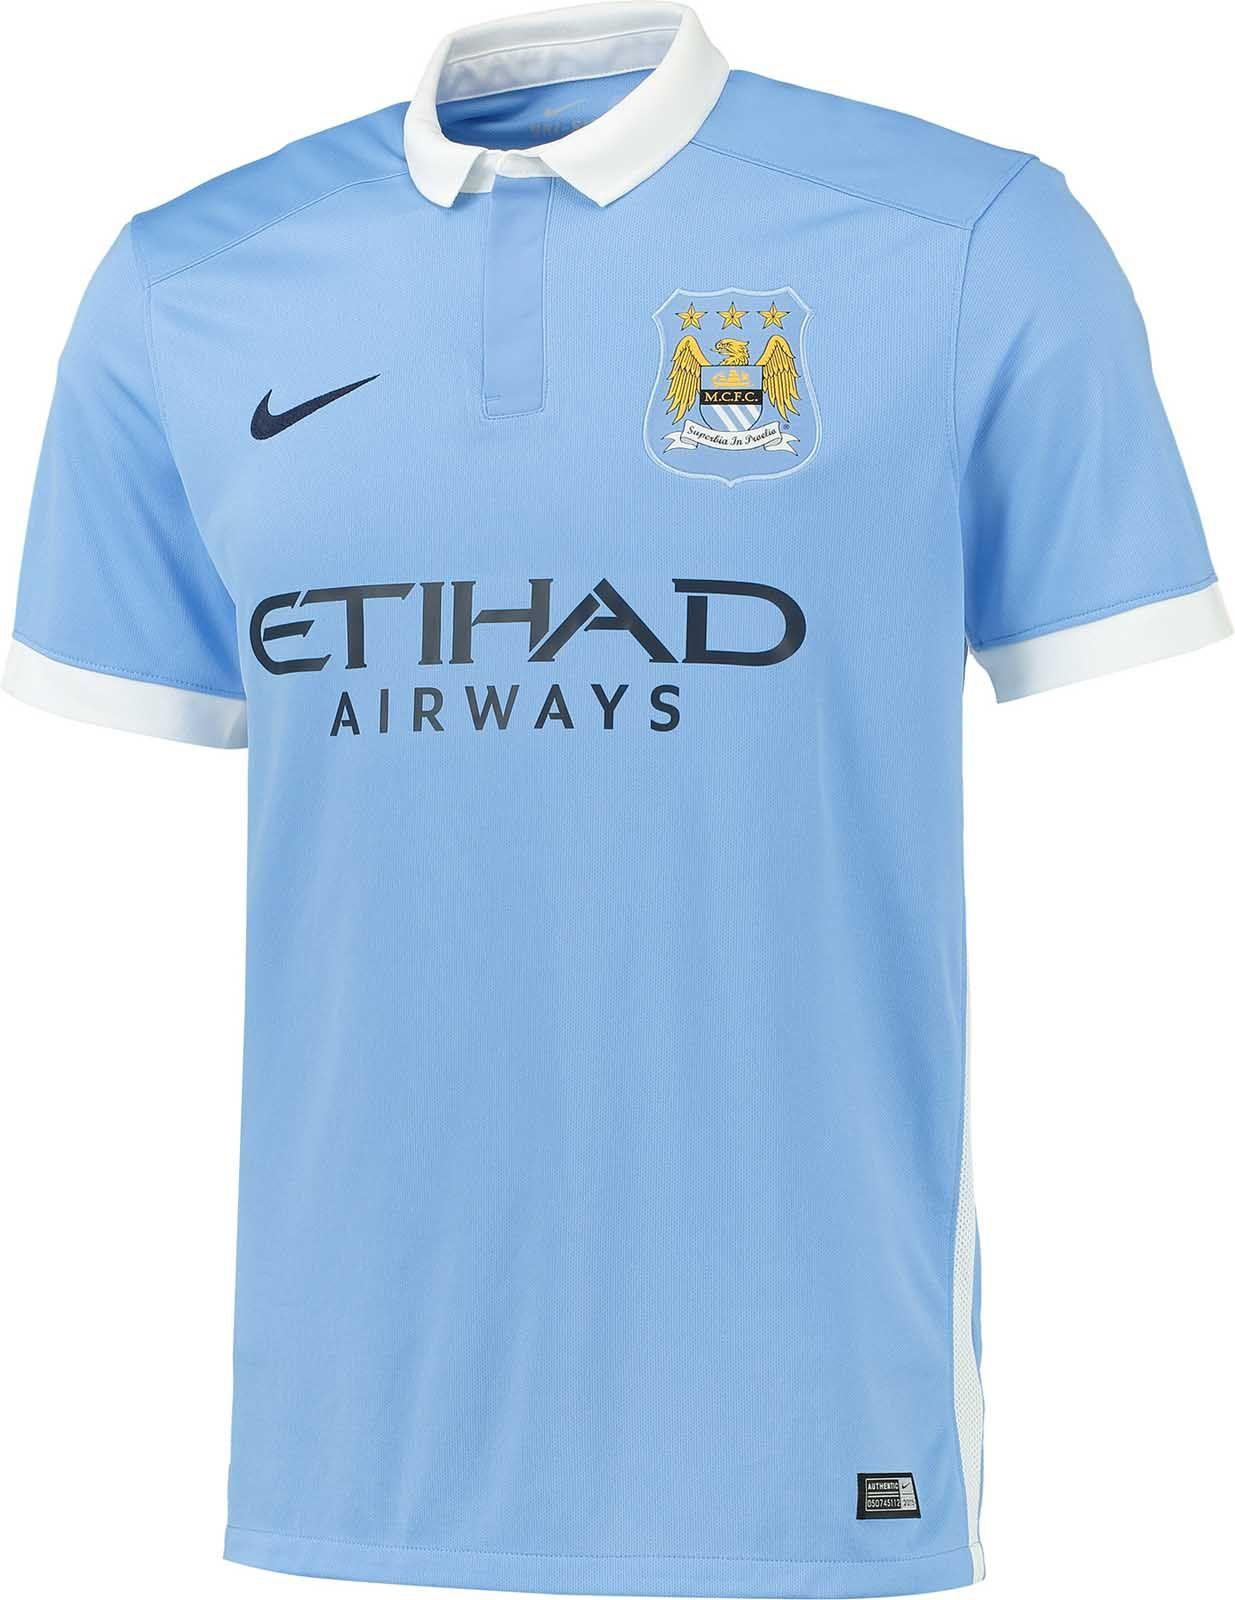 98c4ff2de98 Manchester City 15-16 Home Kit Released | Football (soccer ...